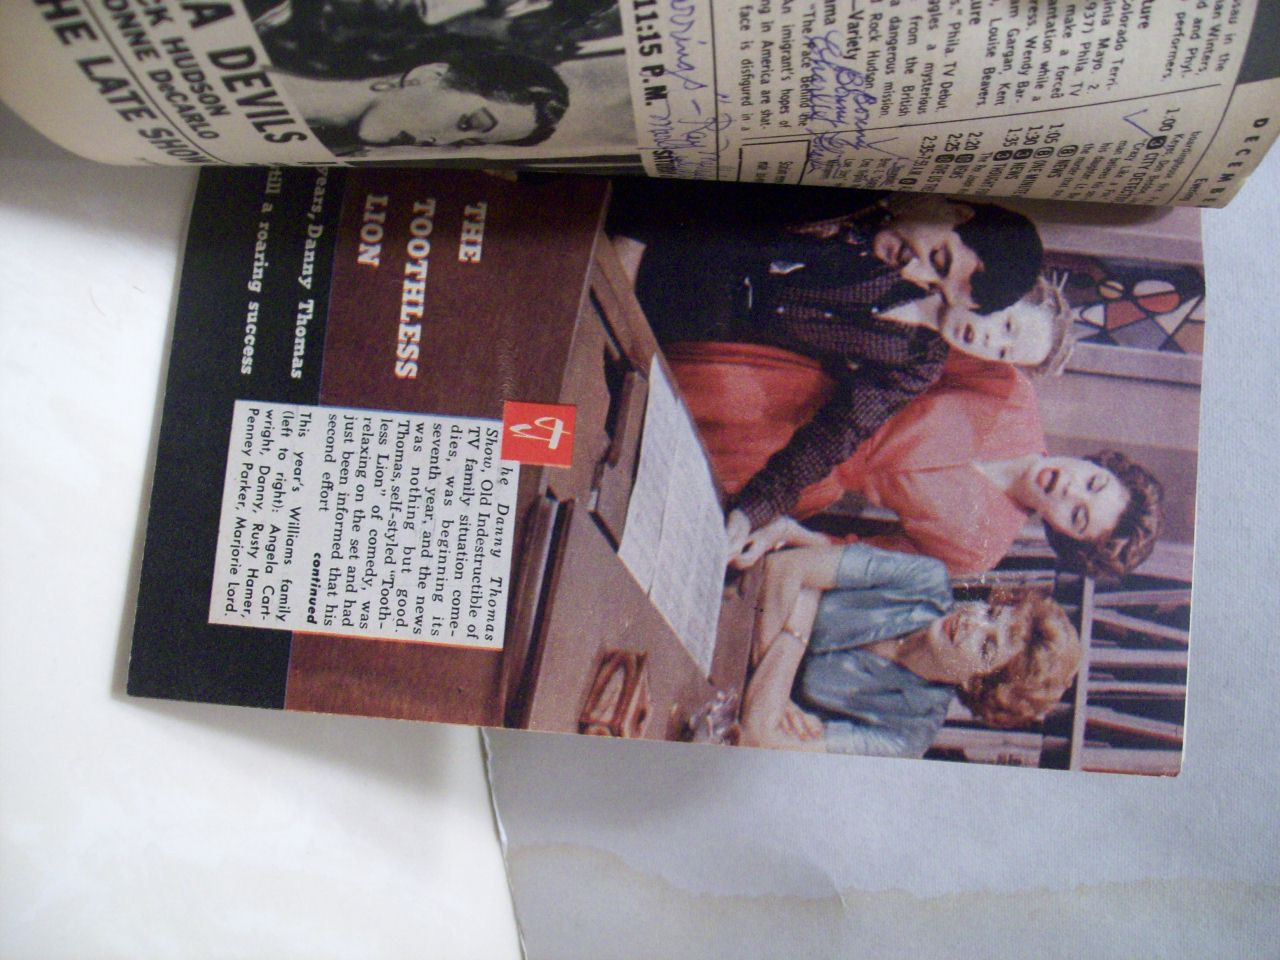 Thomas, Danny Tv Guide Signed Autograph 1959